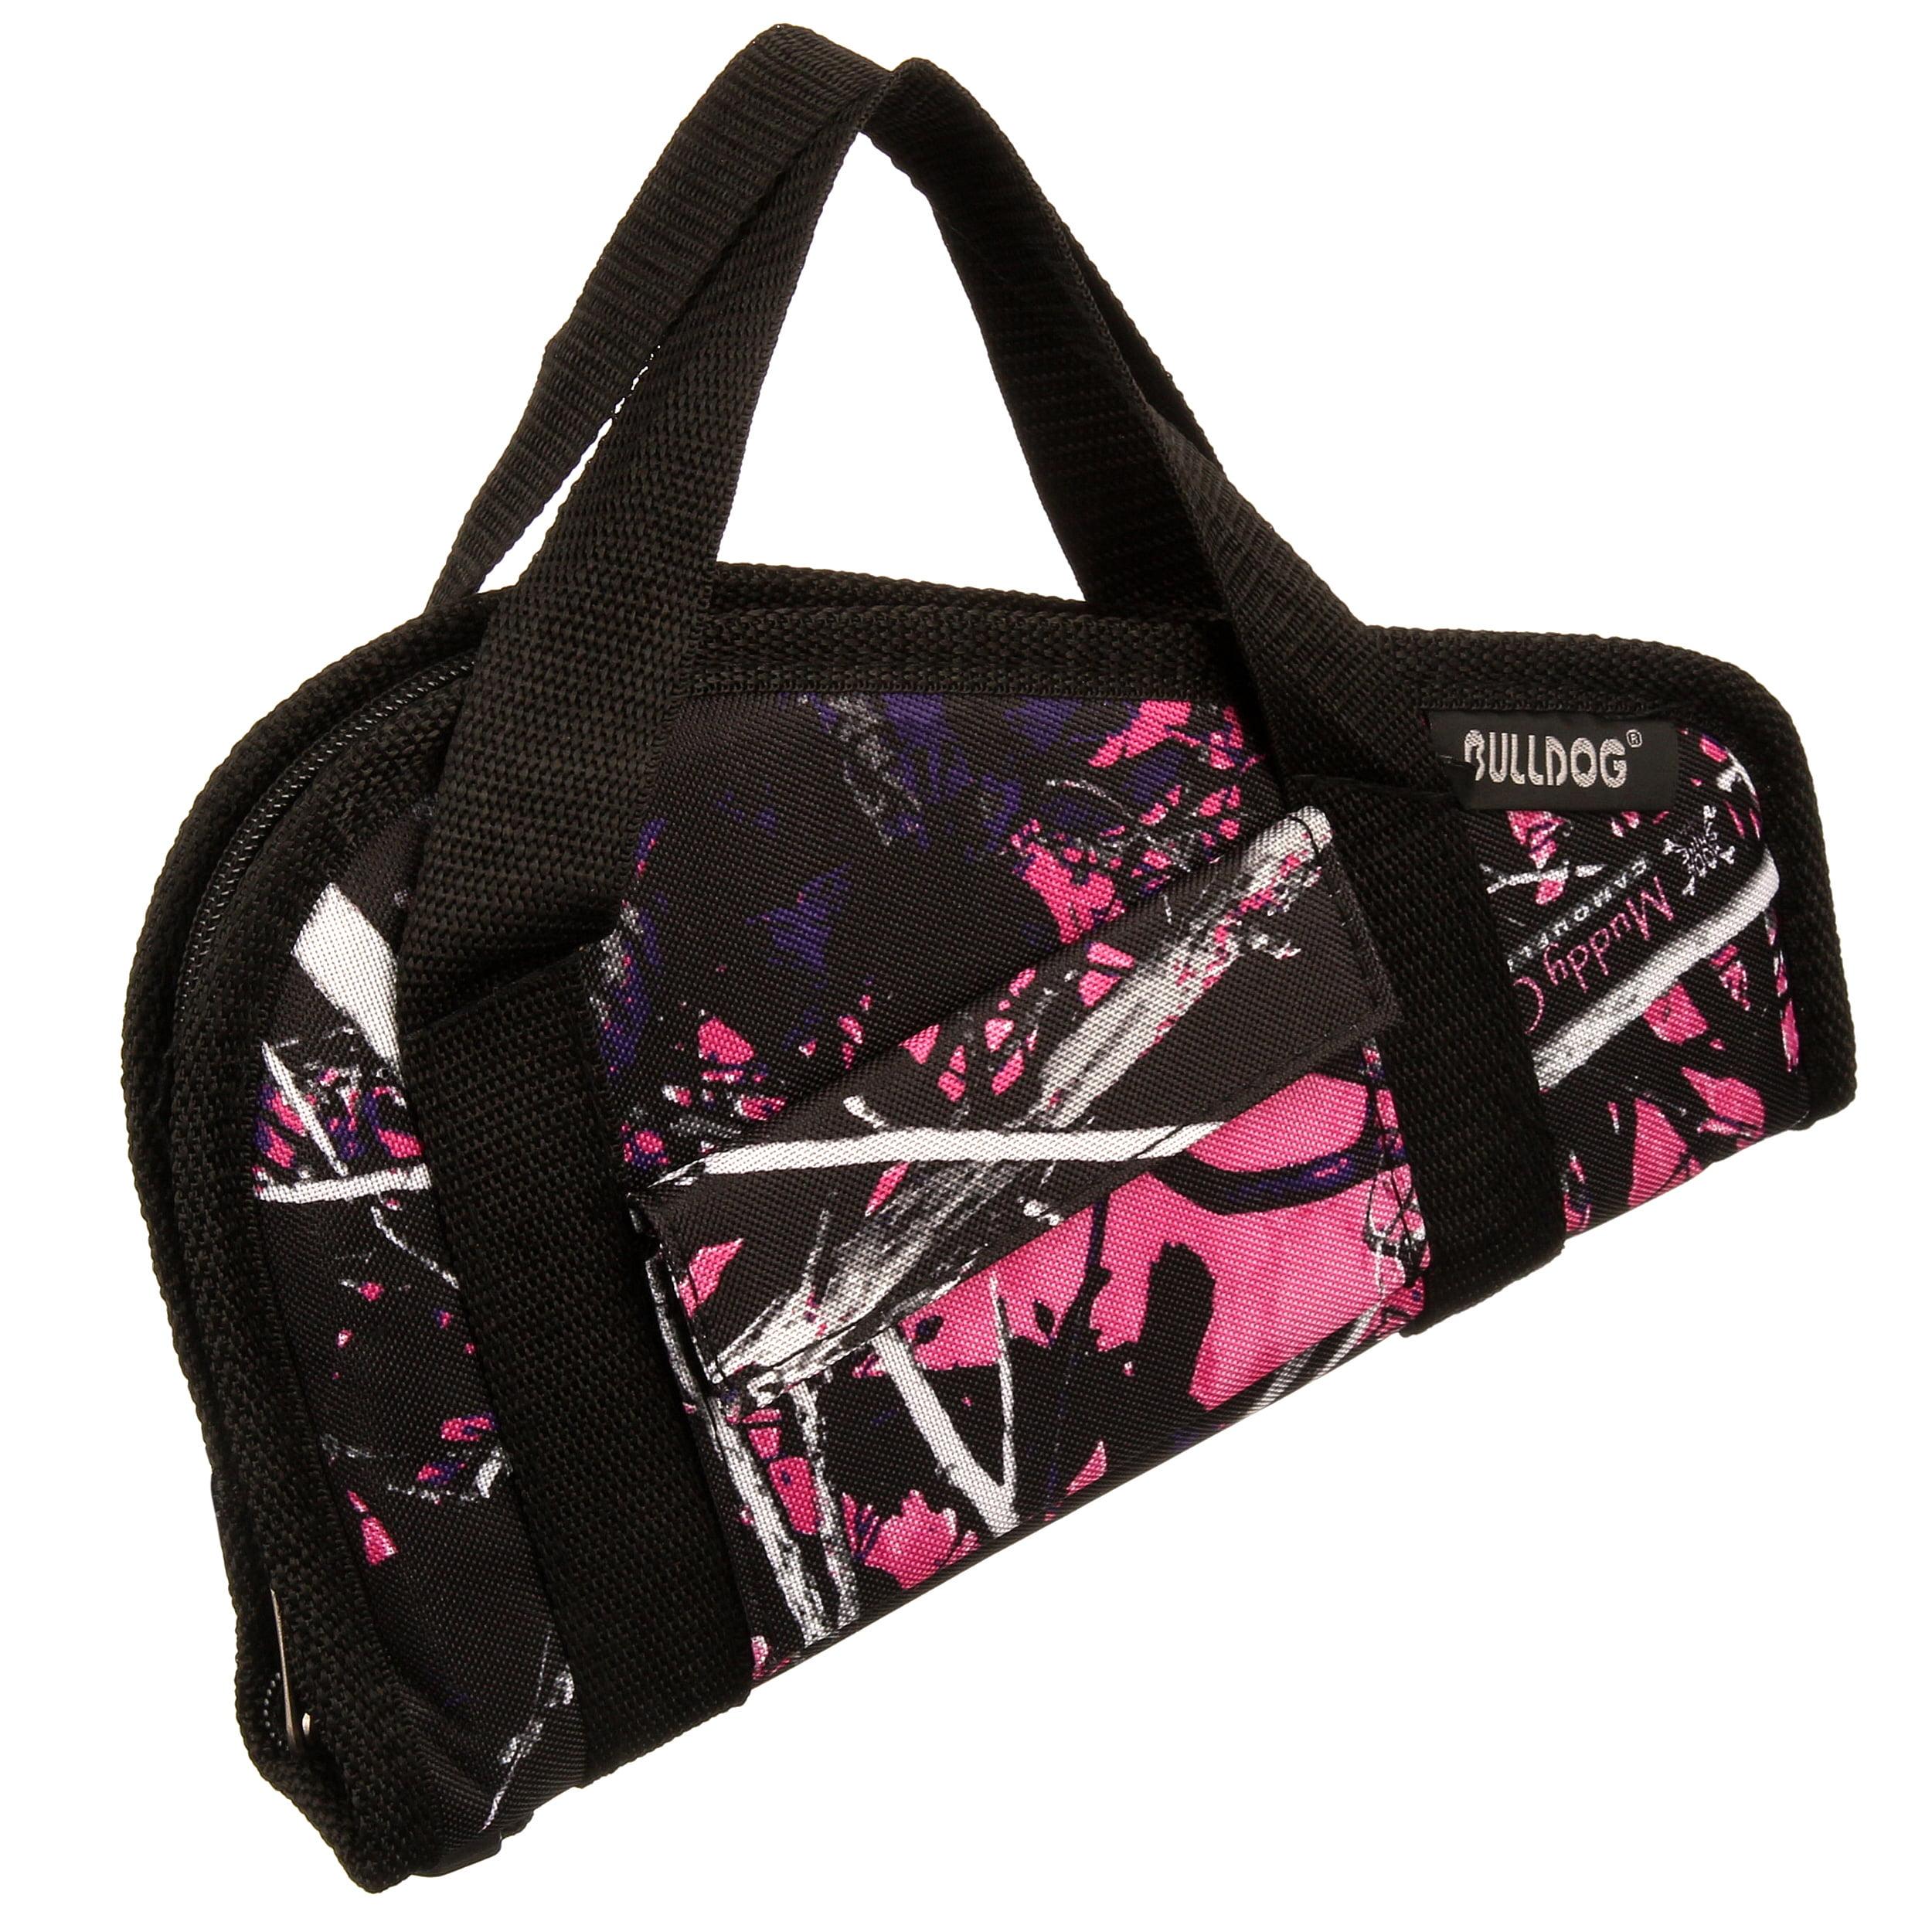 Camo//Black Bulldog Cases Deluxe Muddy Girl Range Bag with Strap